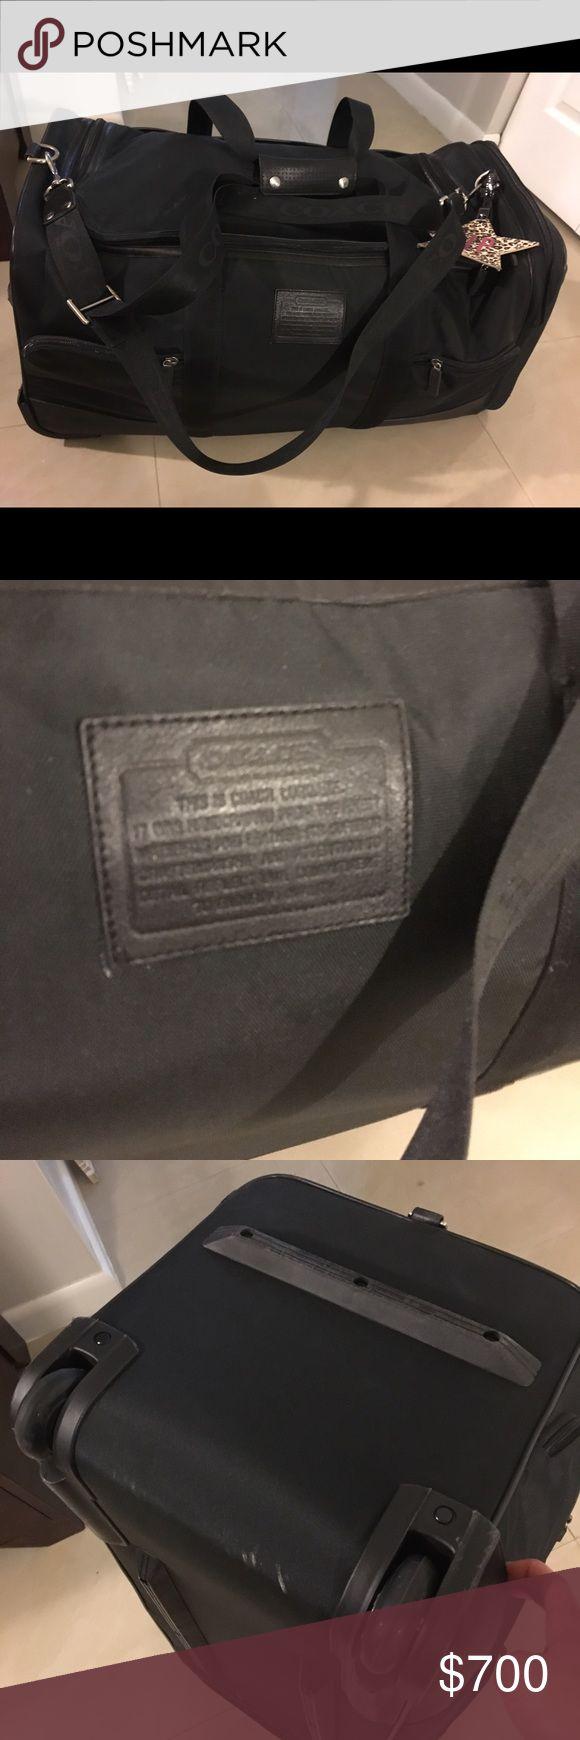 Coach rolling duffle luggage bag Black coach rolling duffle luggage bag Coach Bags Travel Bags